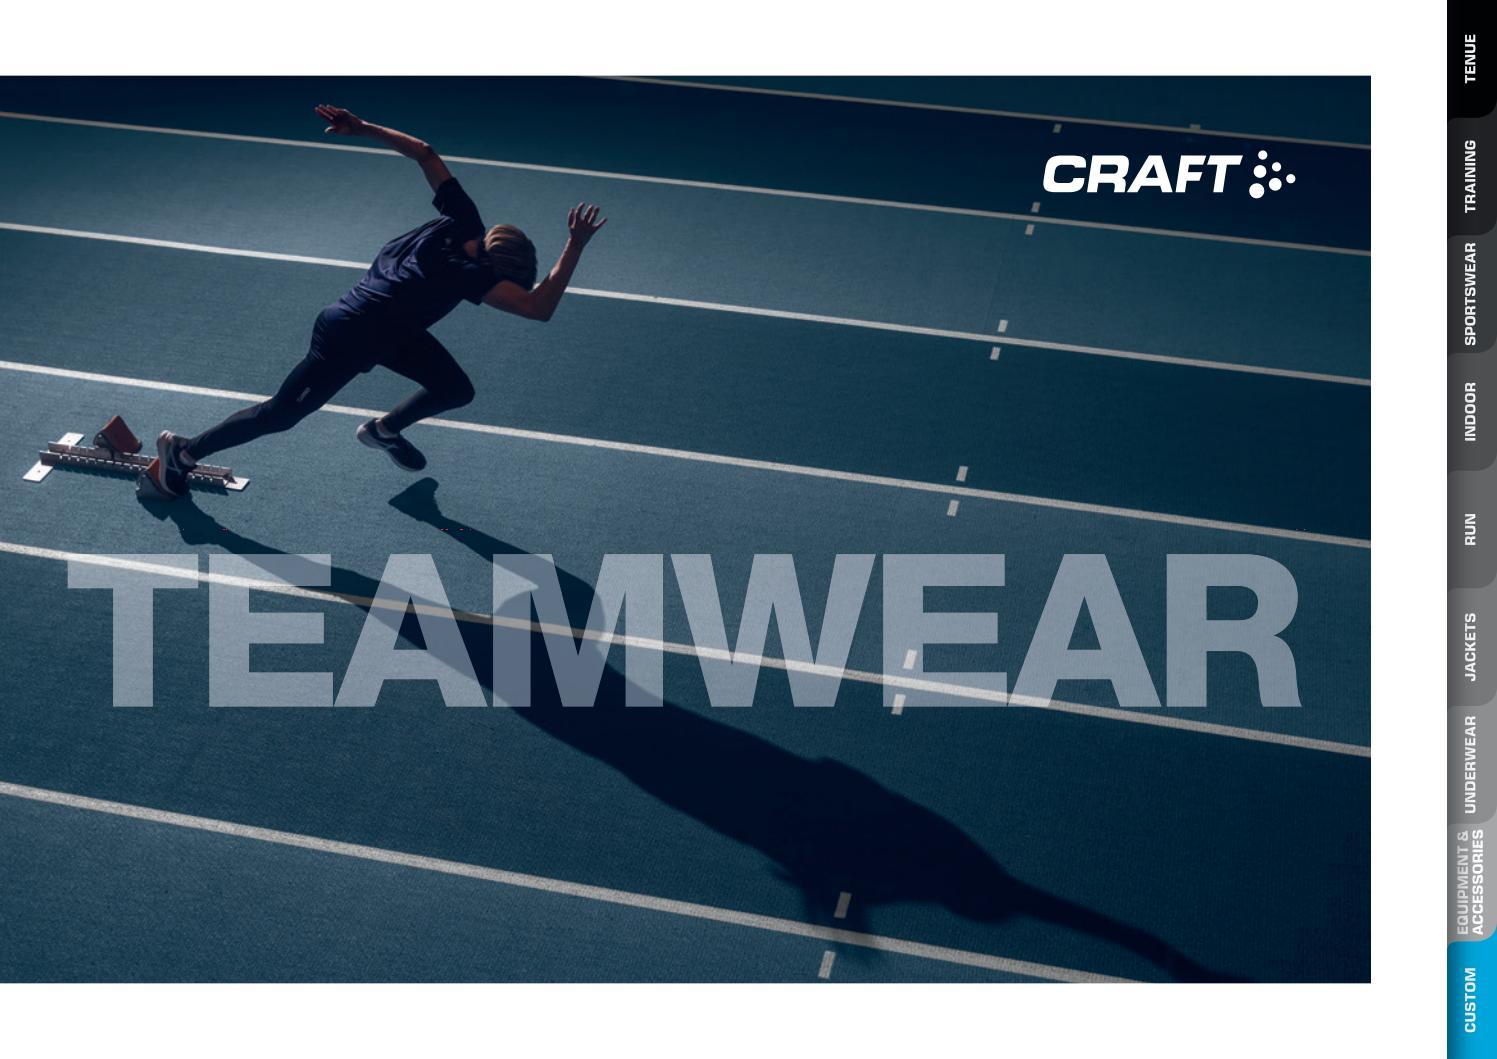 594767a8 Craft Teamwear 2019 Catalogus by unicum6 - issuu